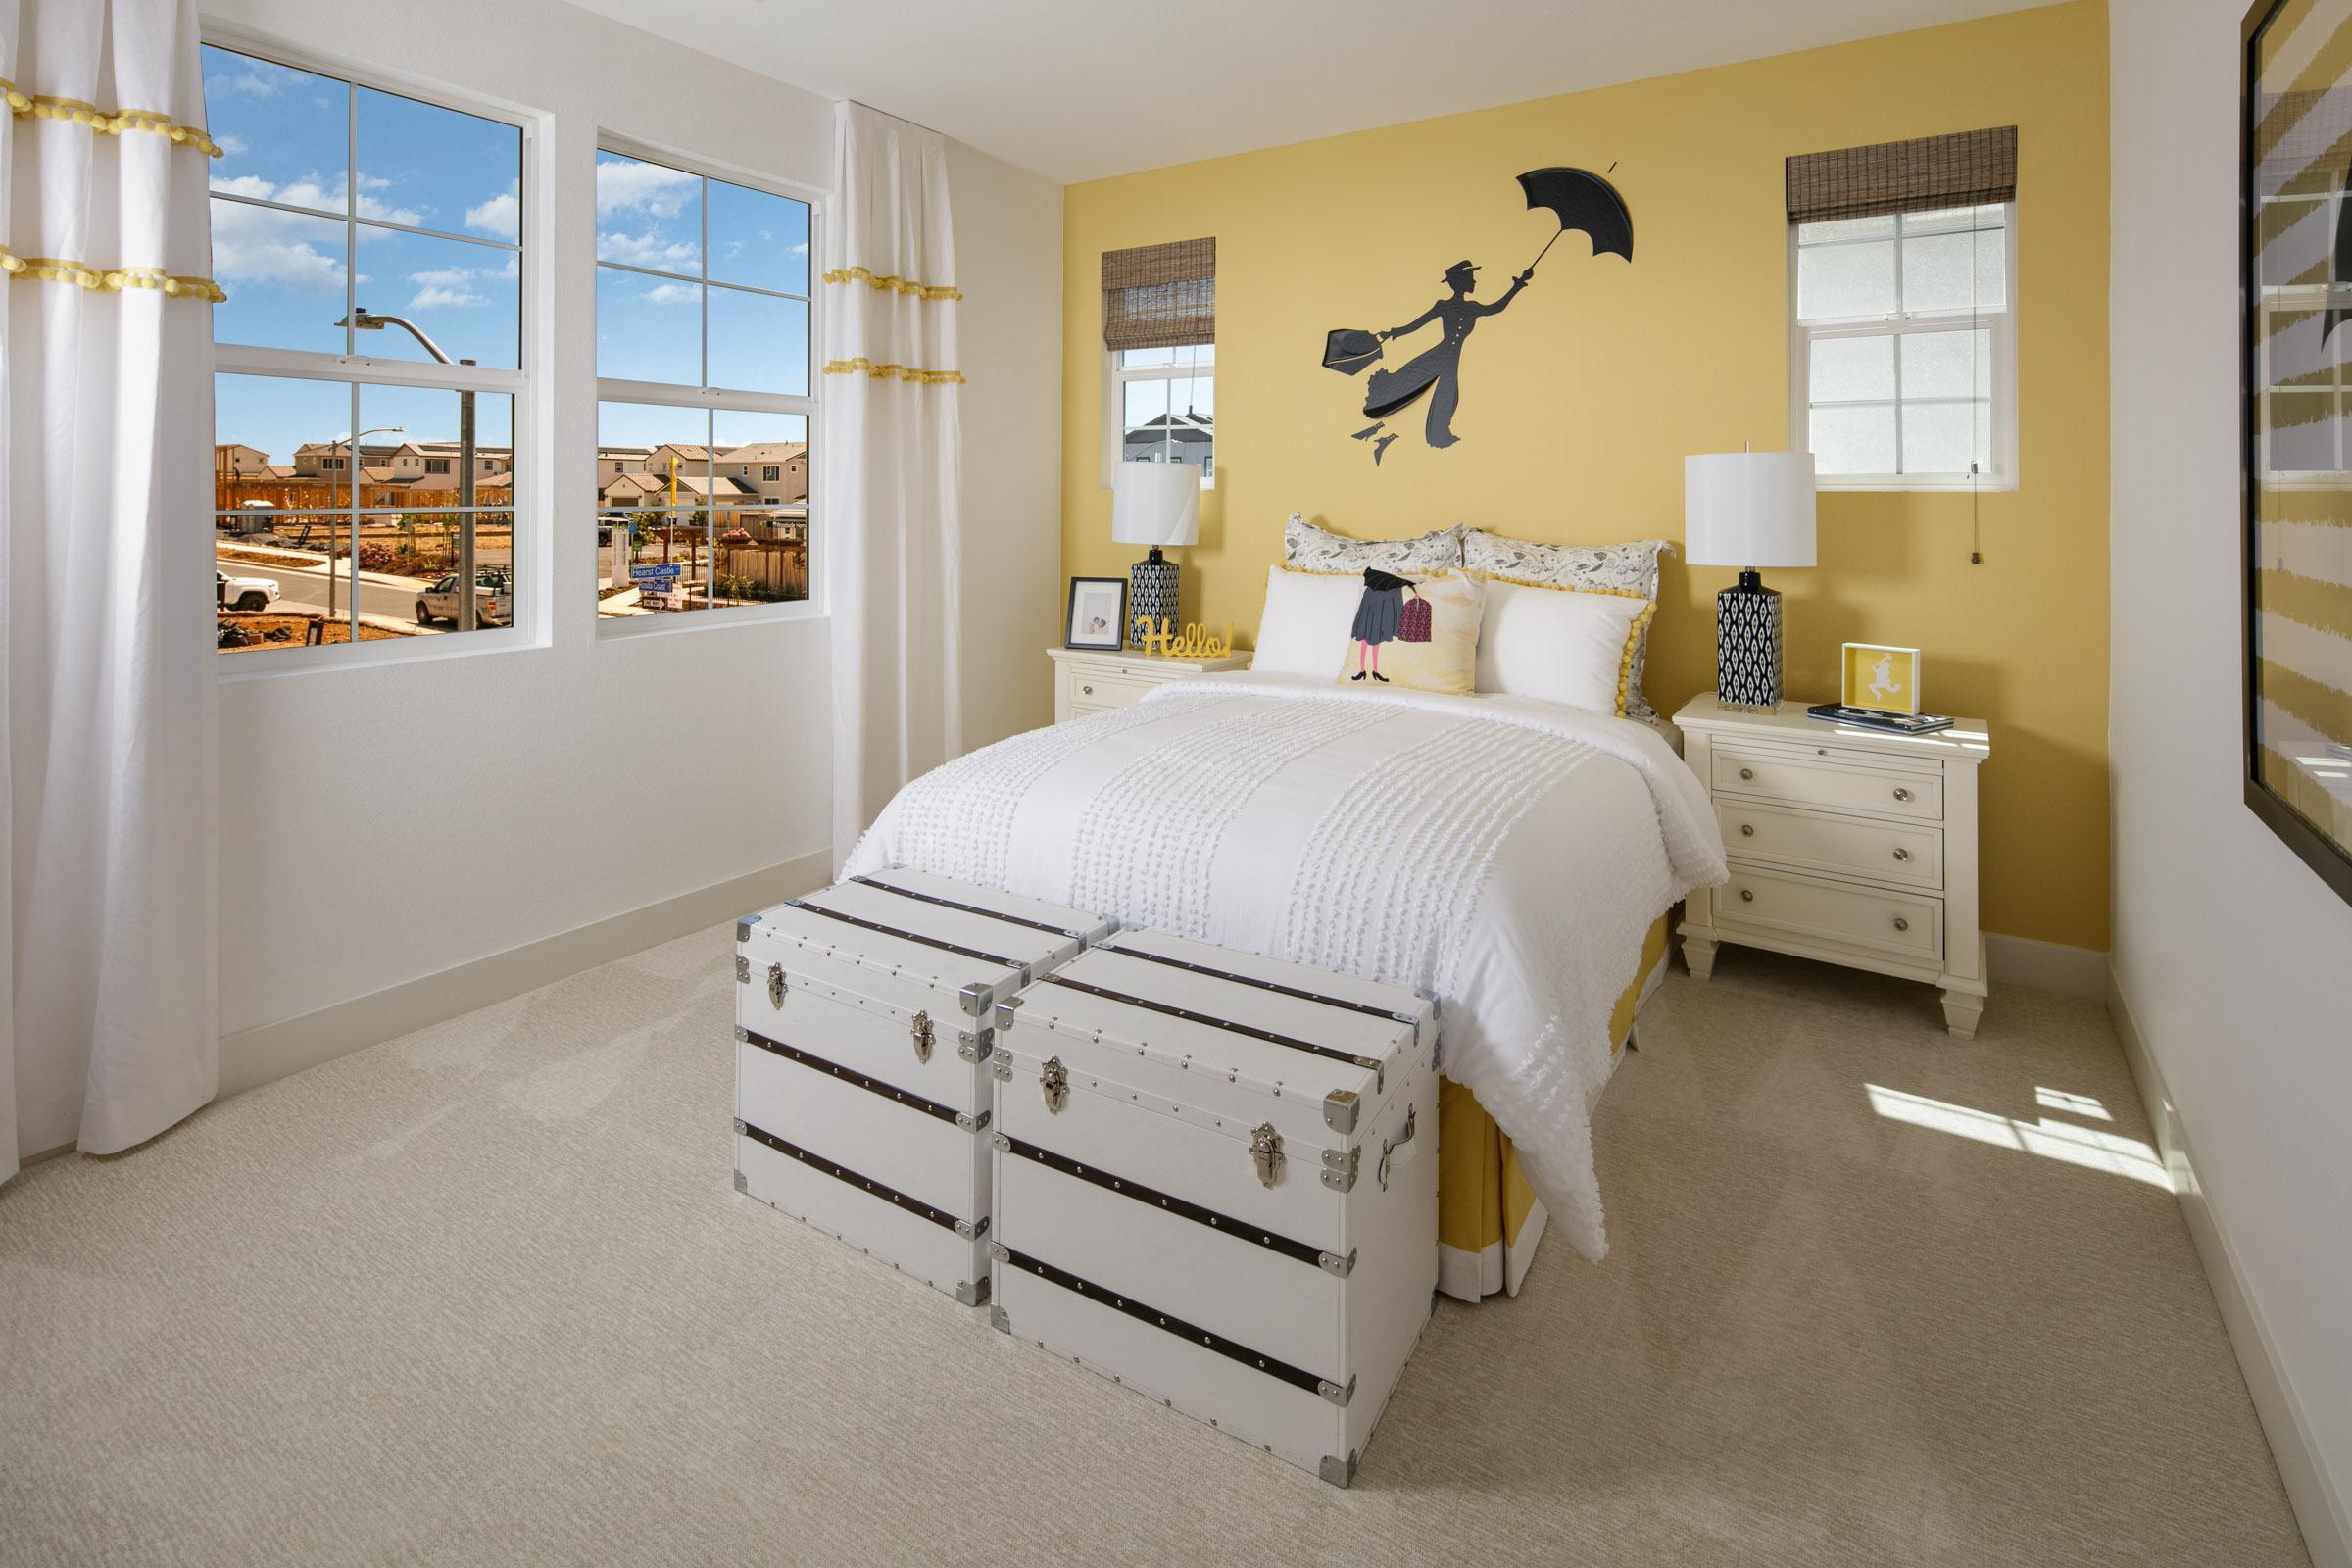 Bedroom featured in the Plan 2 By Watt Communities in Sacramento, CA